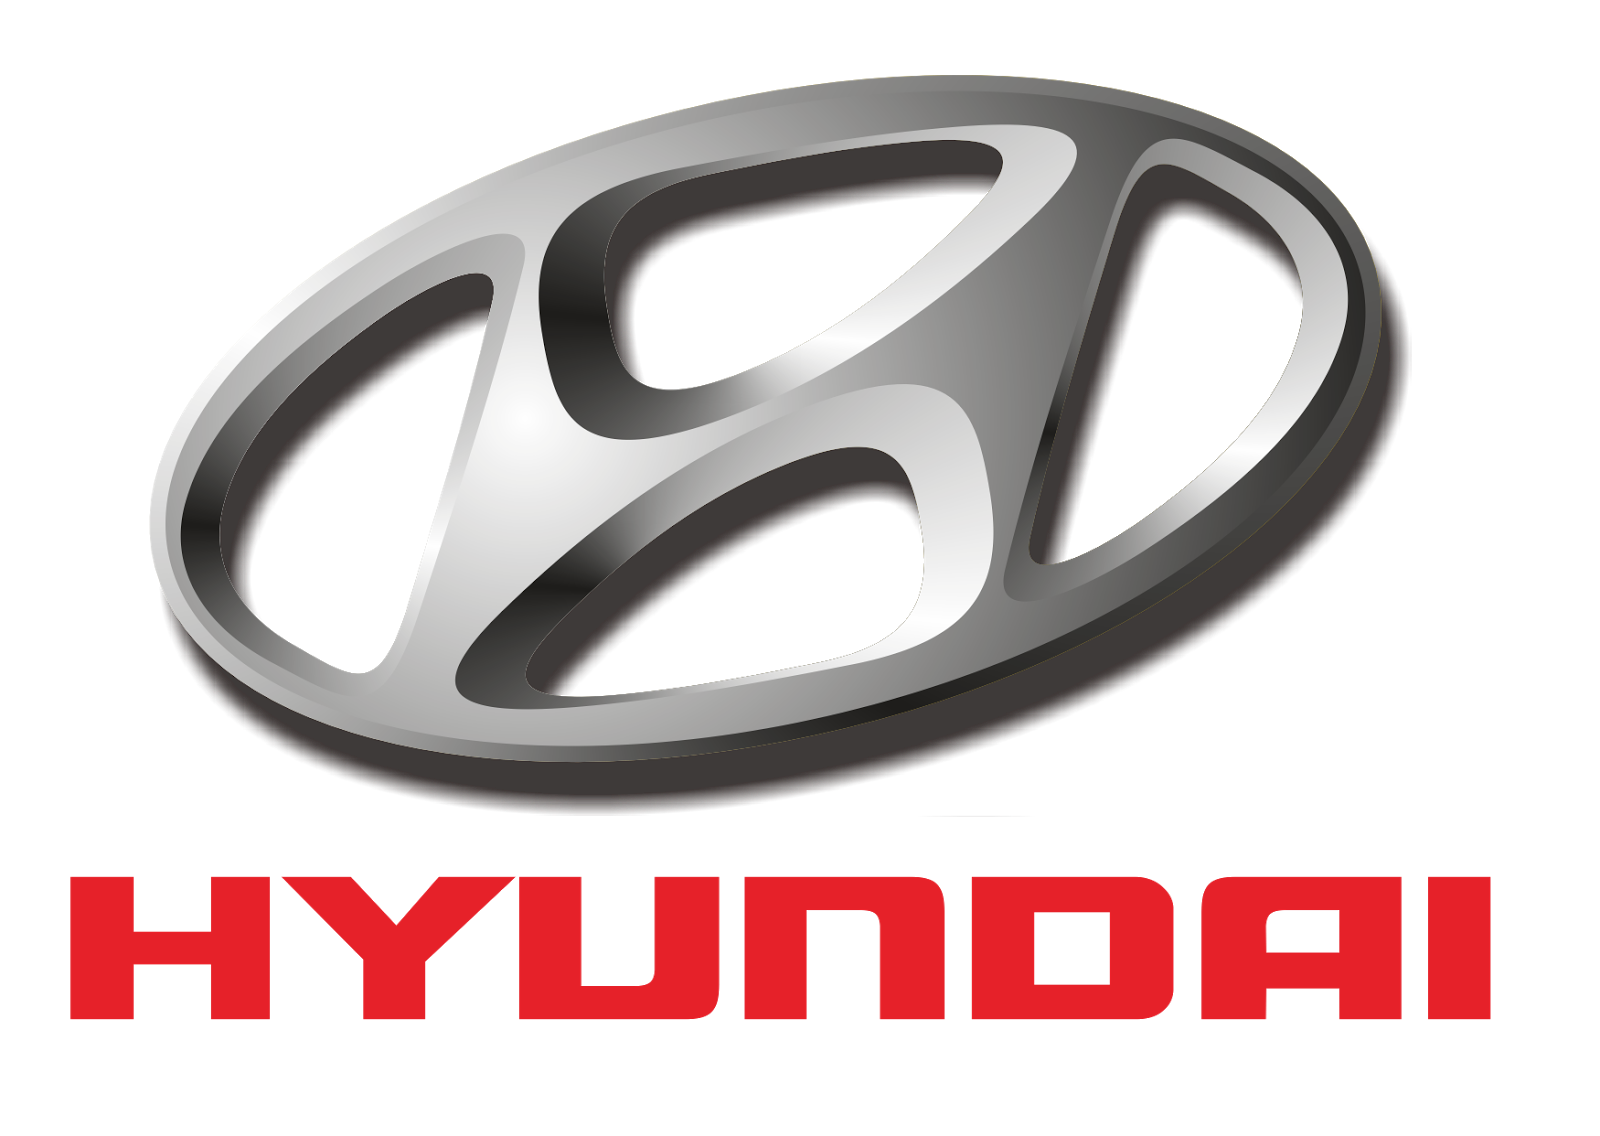 hyundai vector logo png transparent hyundai vector logo